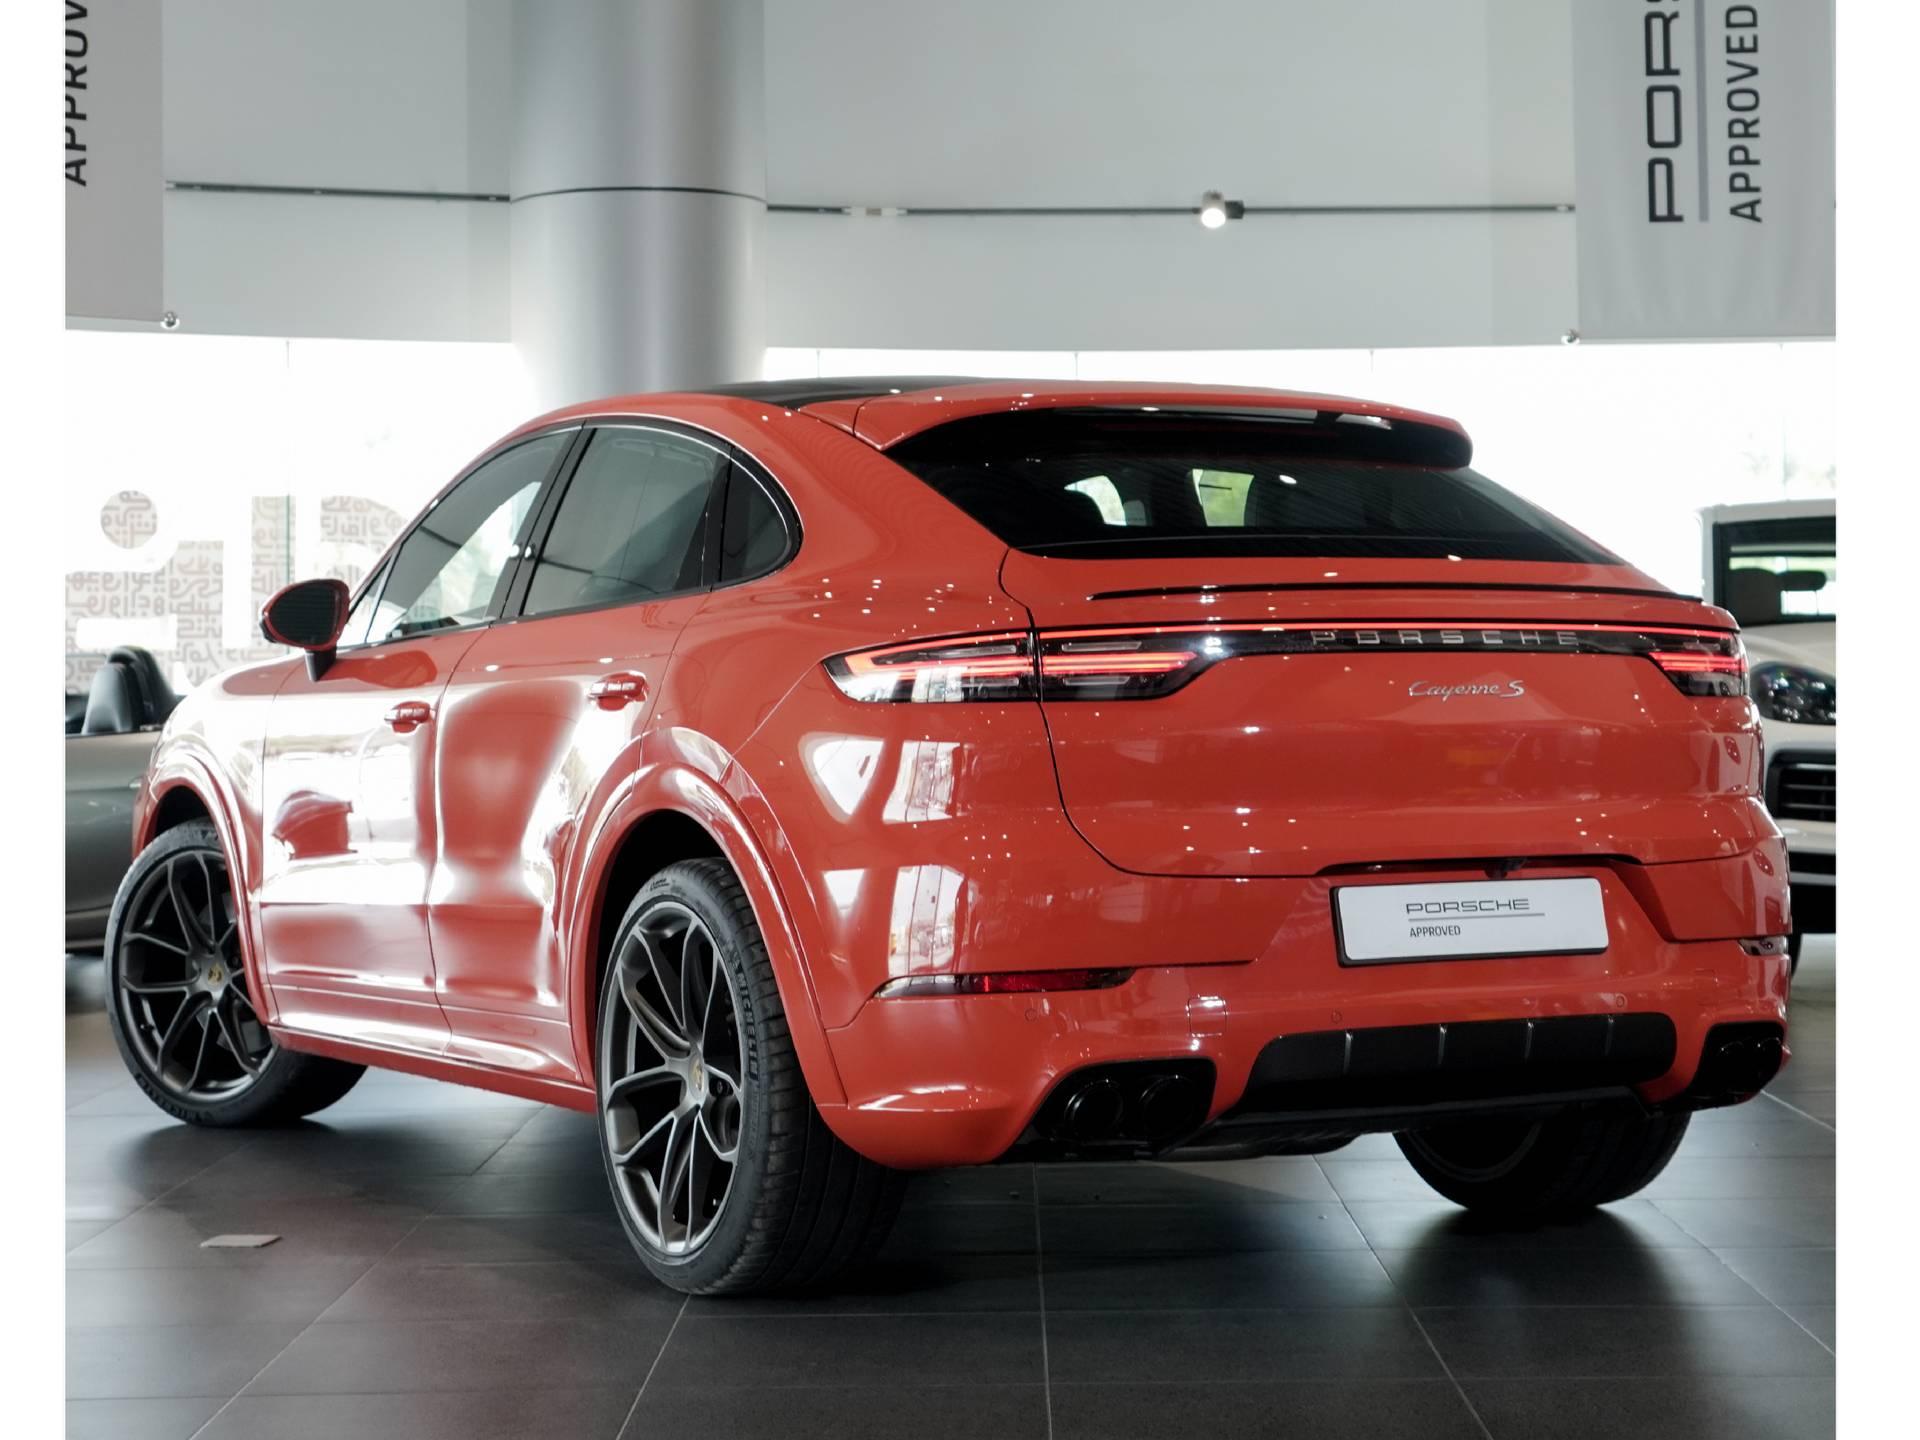 2020 Porsche Cayenne S Coupé – 2